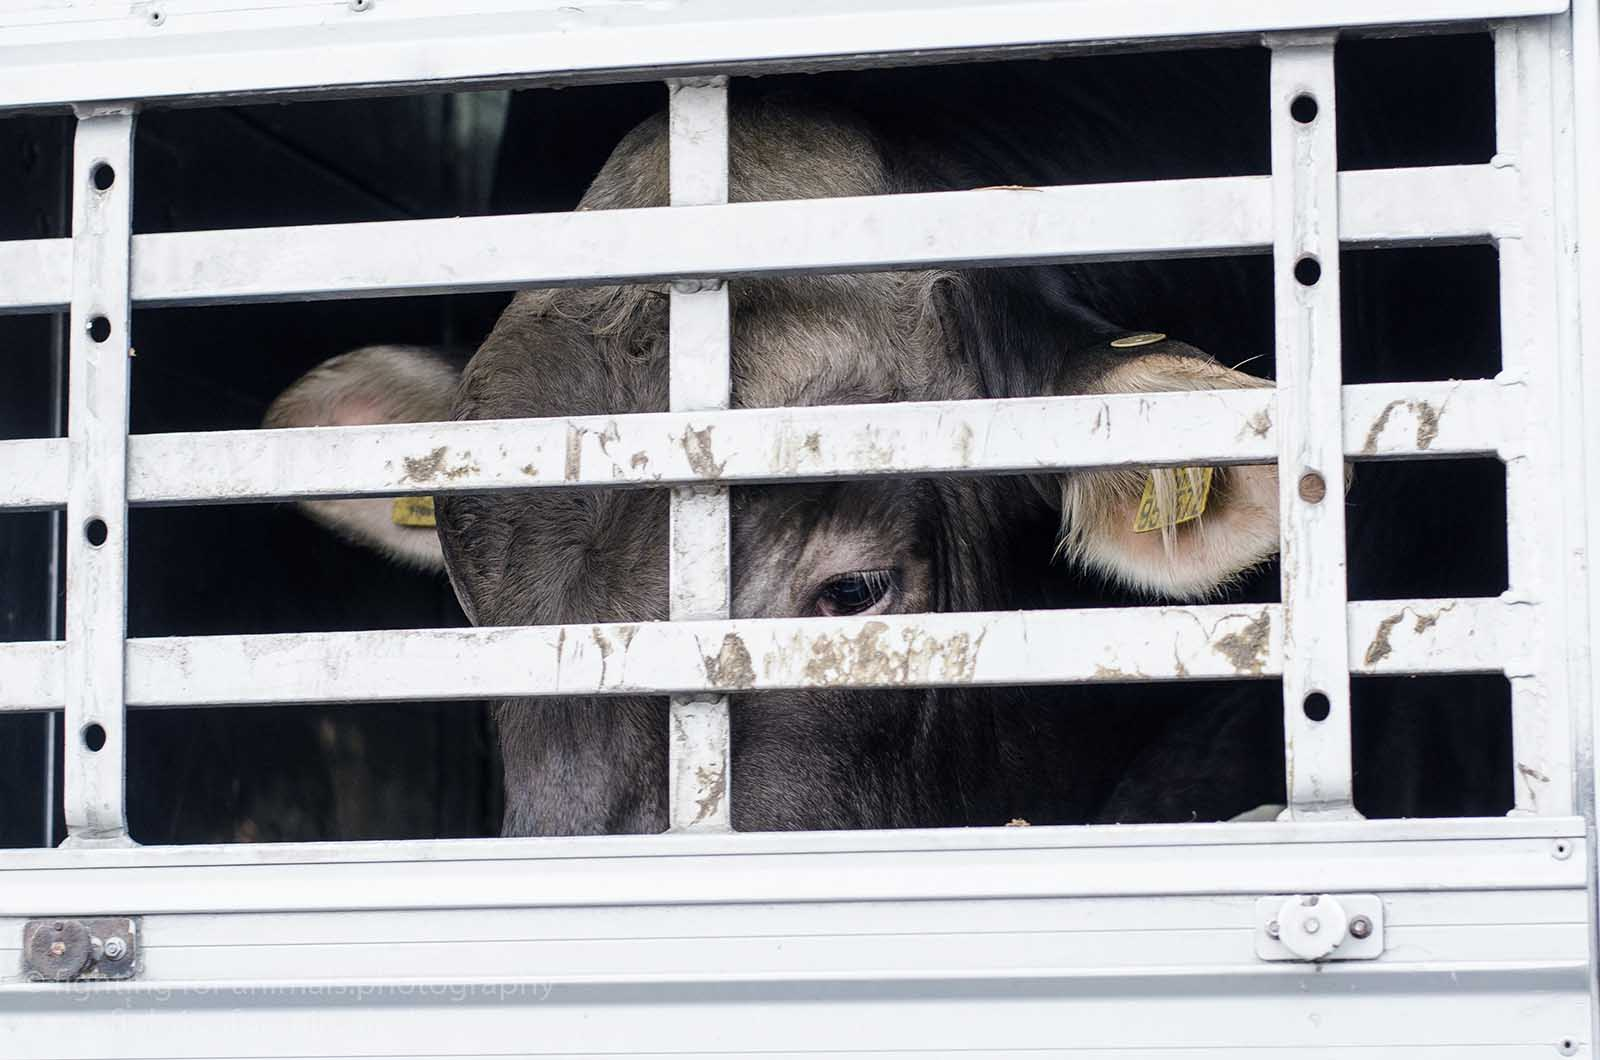 Kuh im Tiertransporter